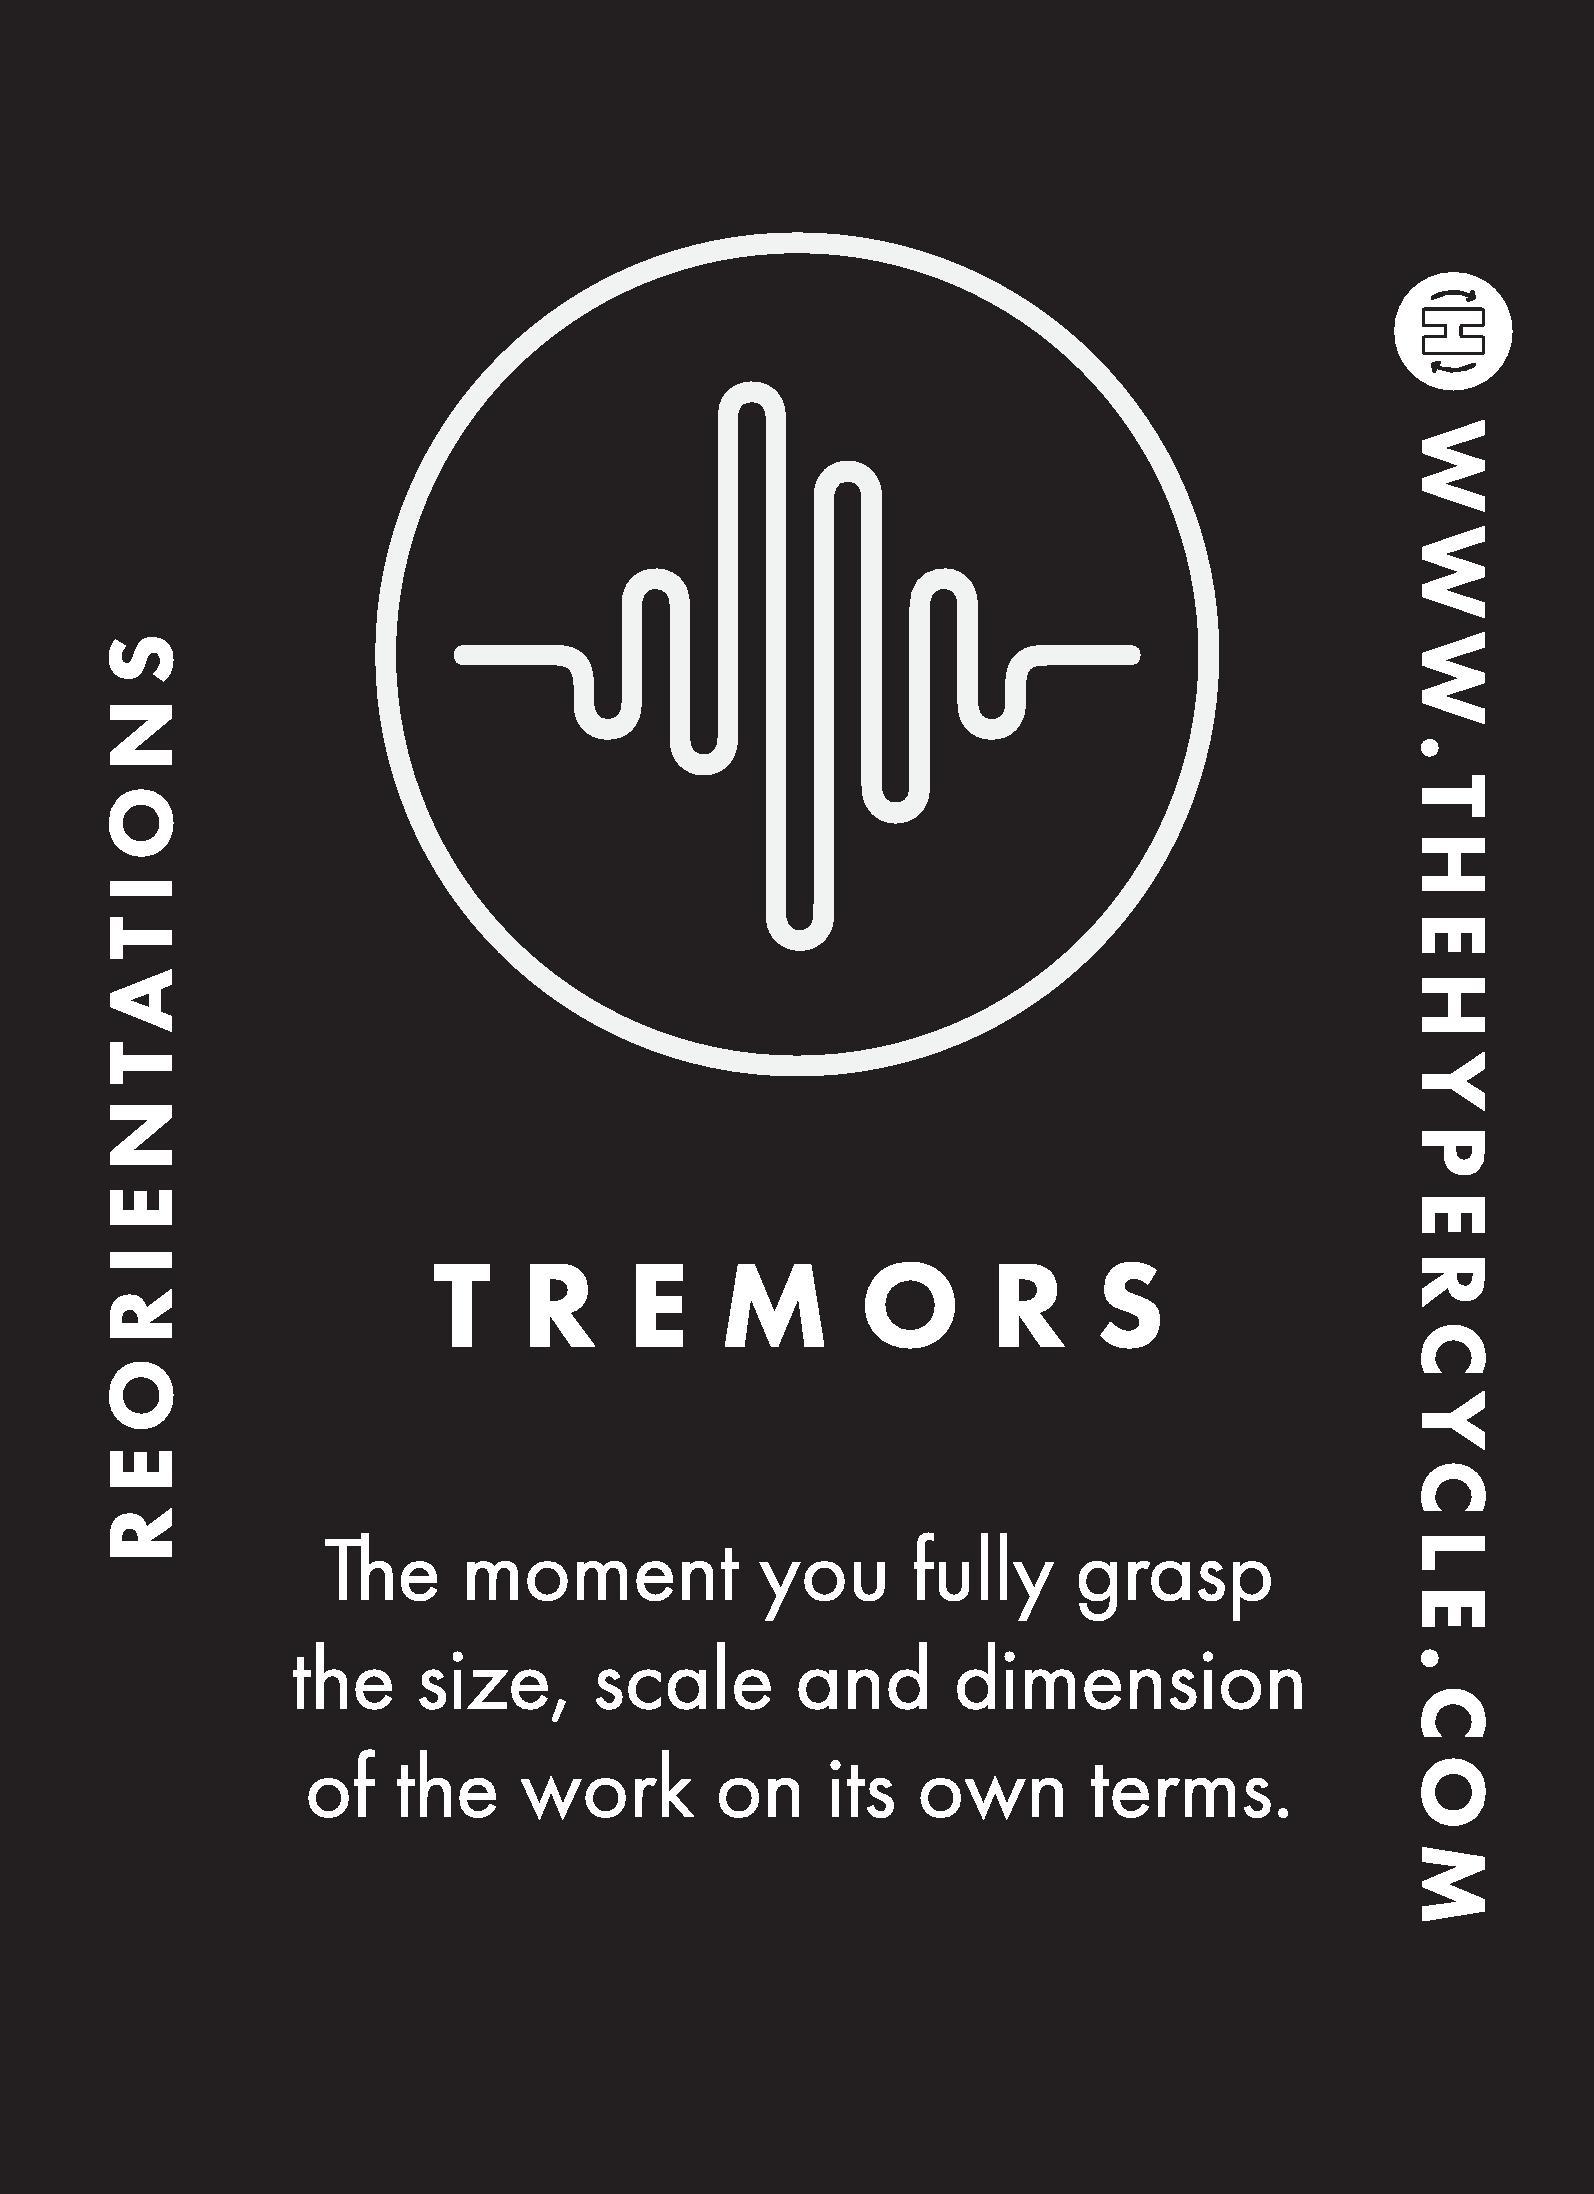 Tremors-page-001.jpg